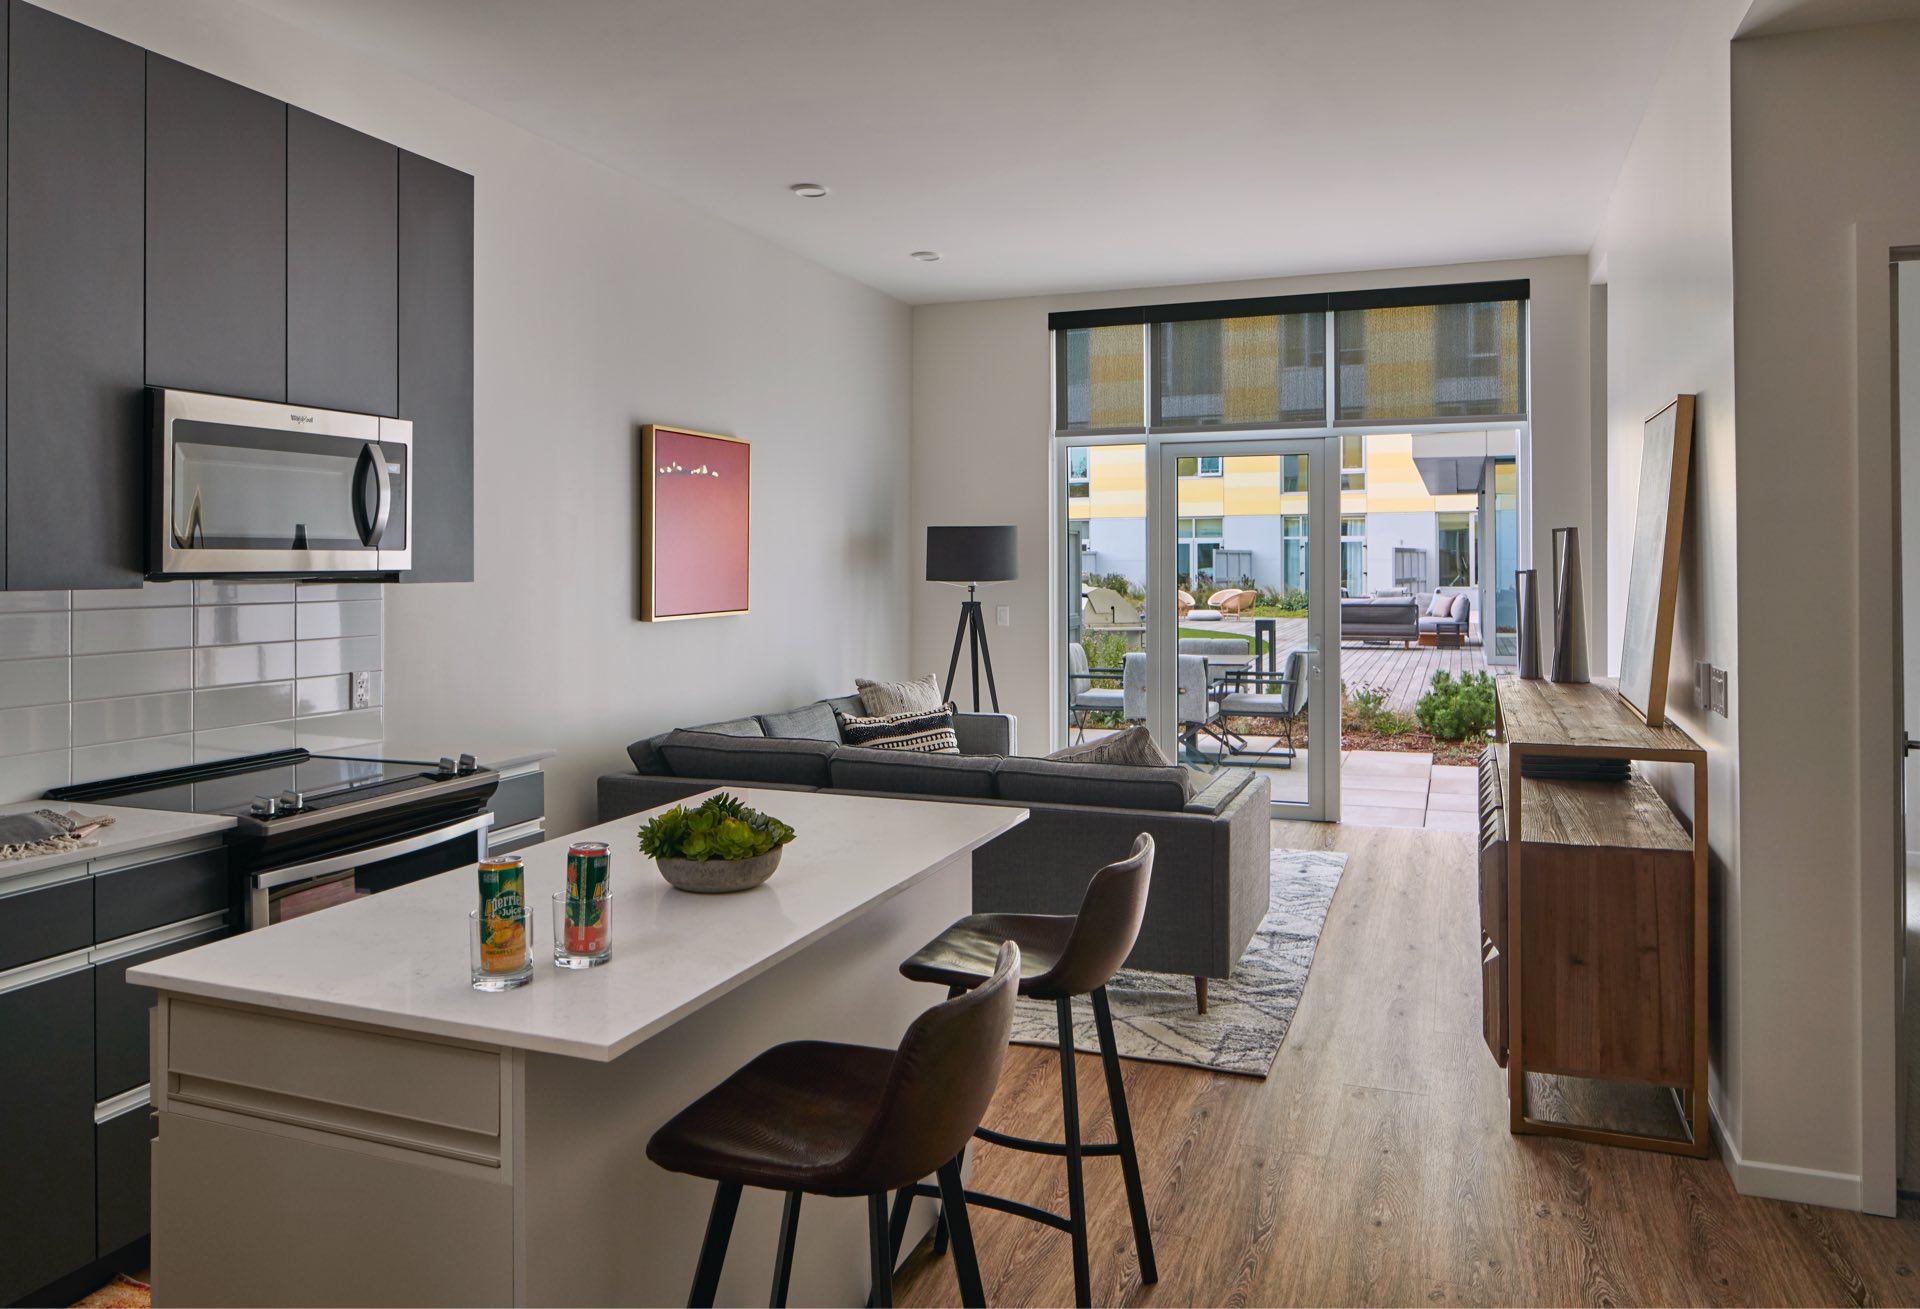 Apartments img 33